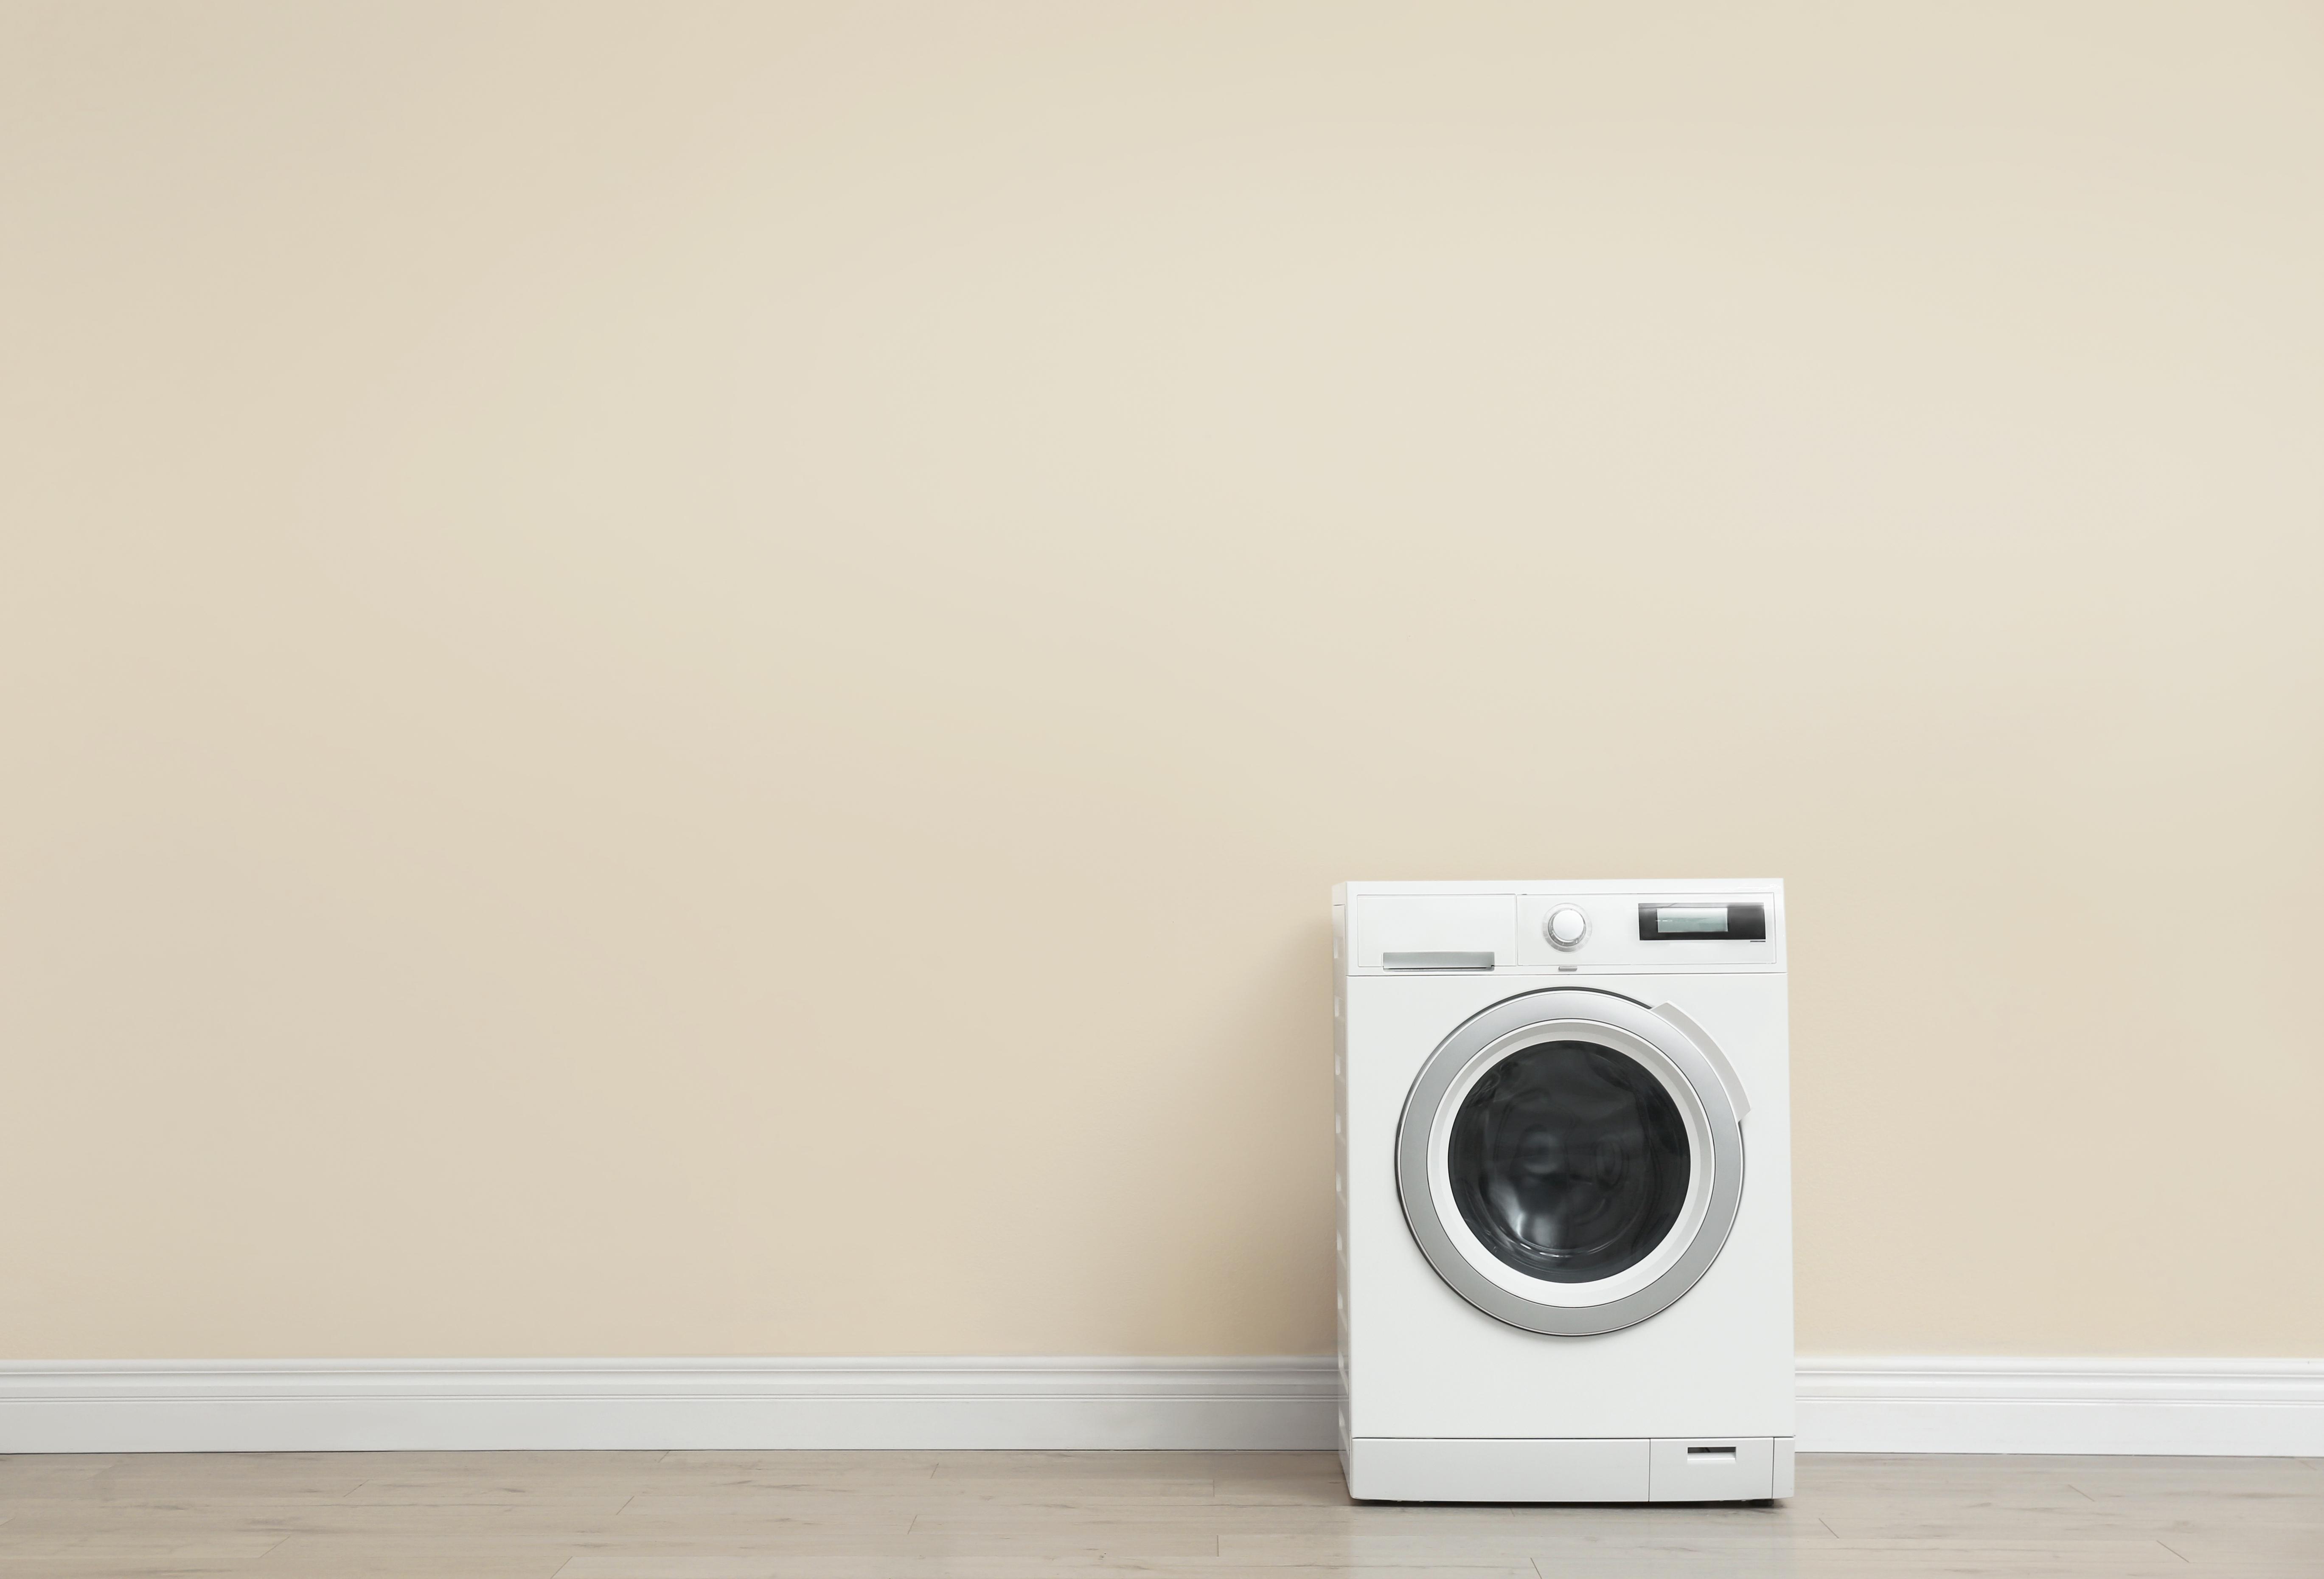 Evita que tu lavadora nueva se mueve mucho al centrifugar